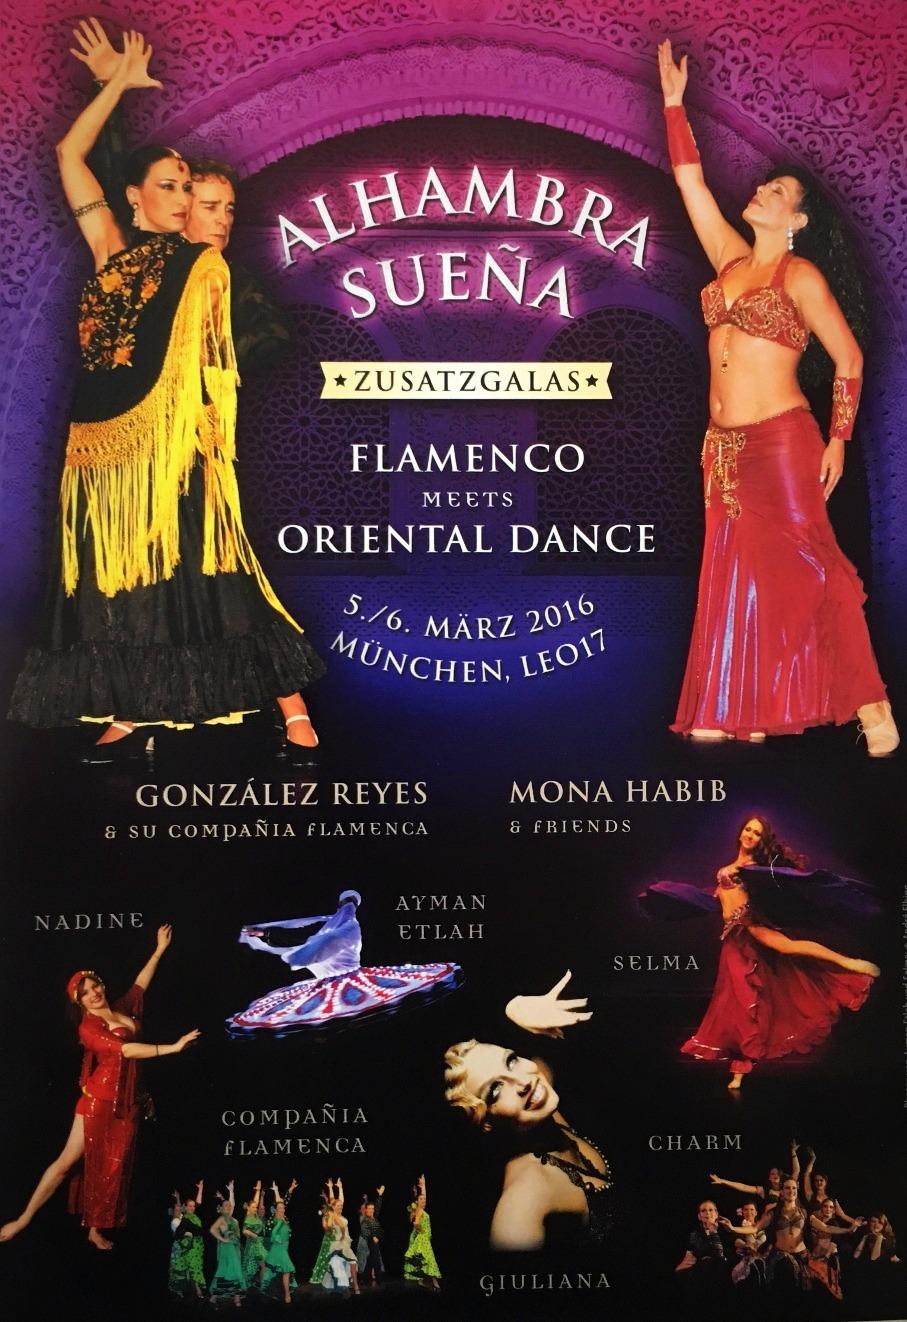 ALHAMBRA SUEÑA - Konzert 2015/2016